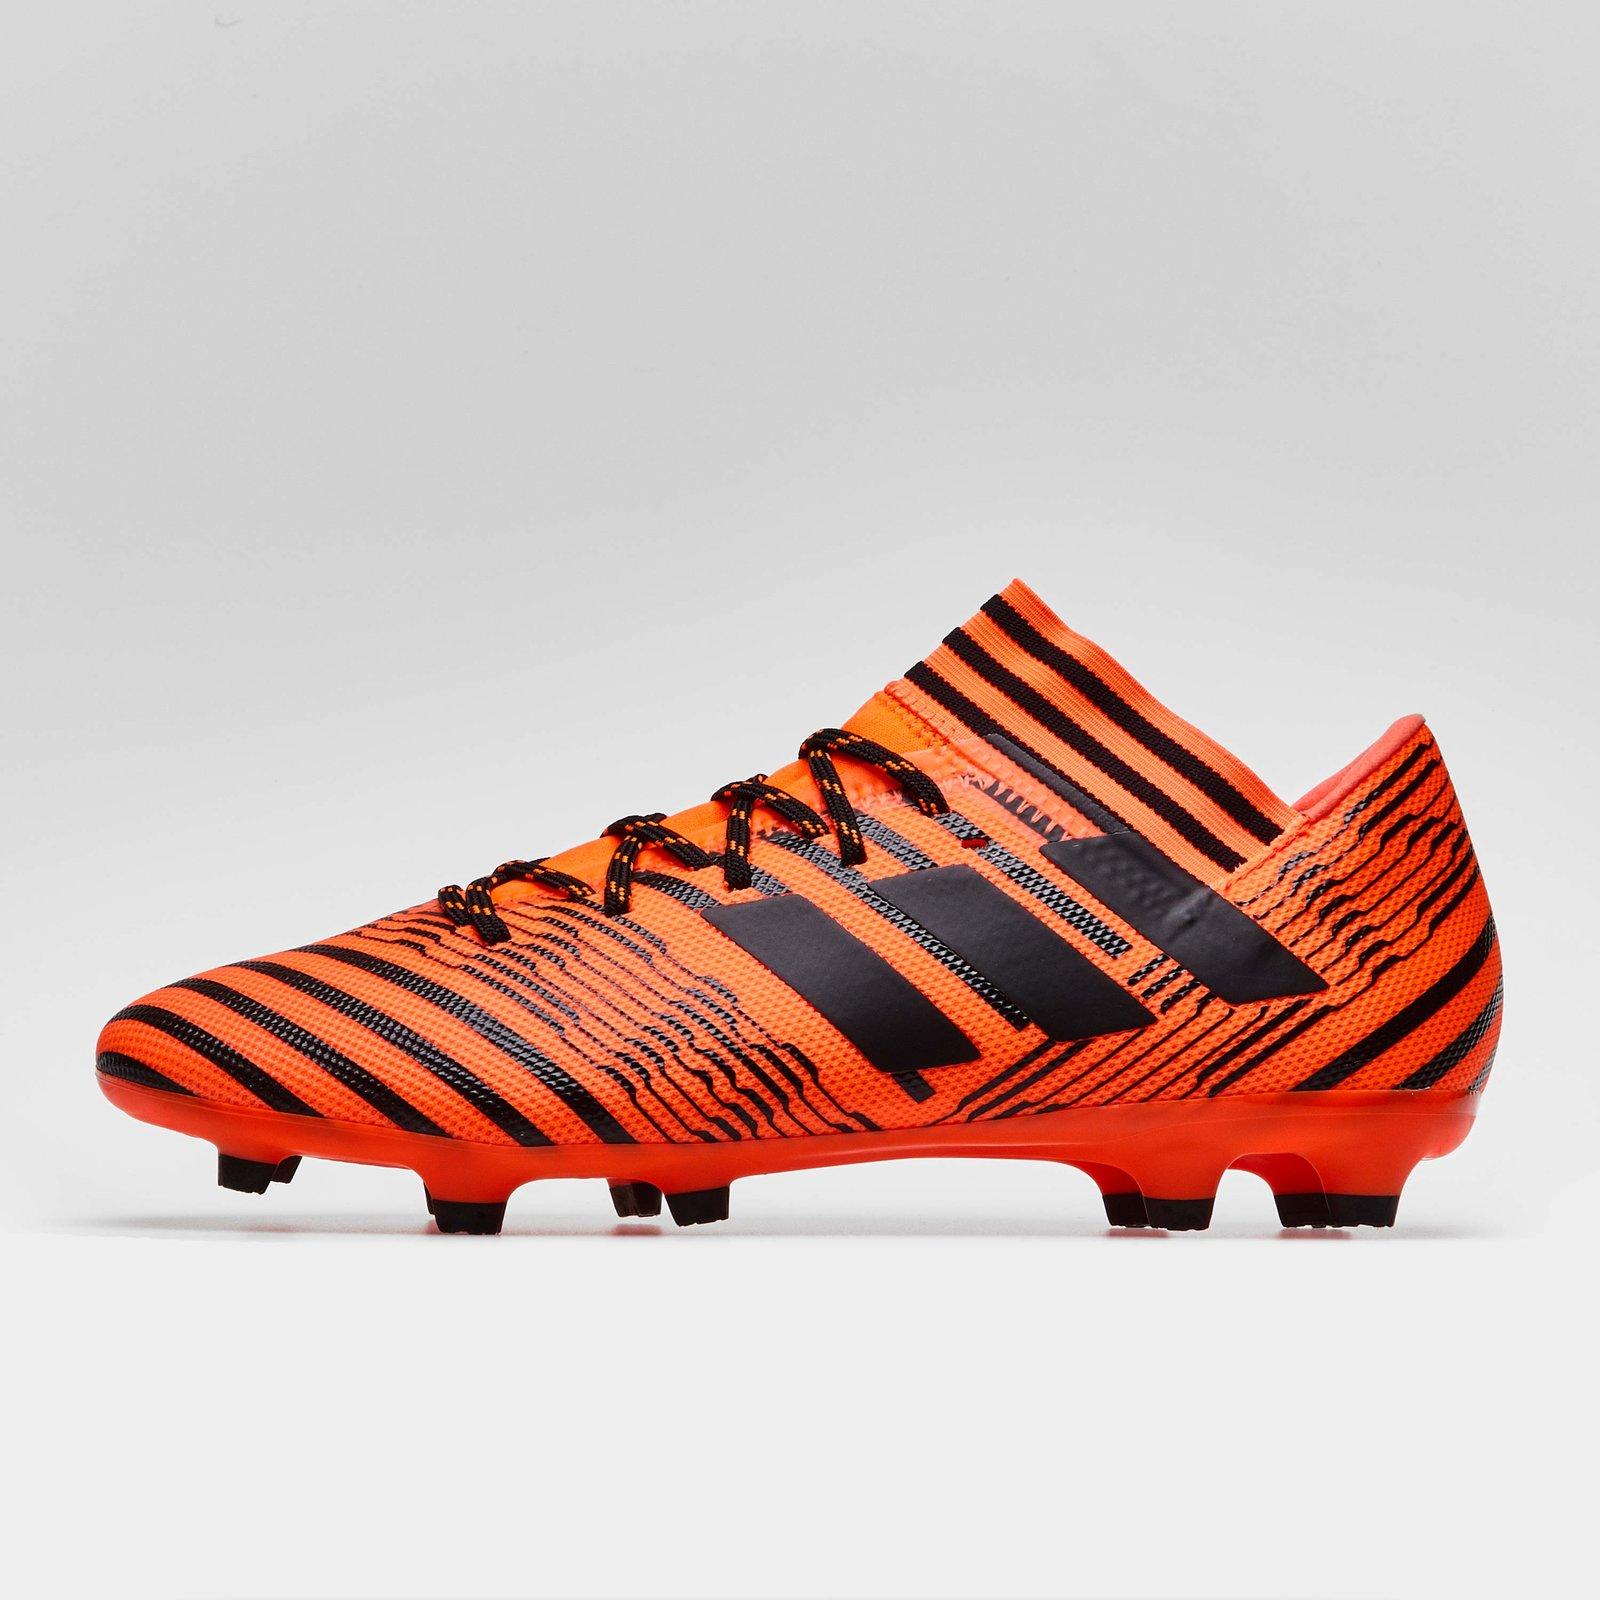 bc2bbdbdde75 adidas Nemeziz 17.3 FG Football Boots